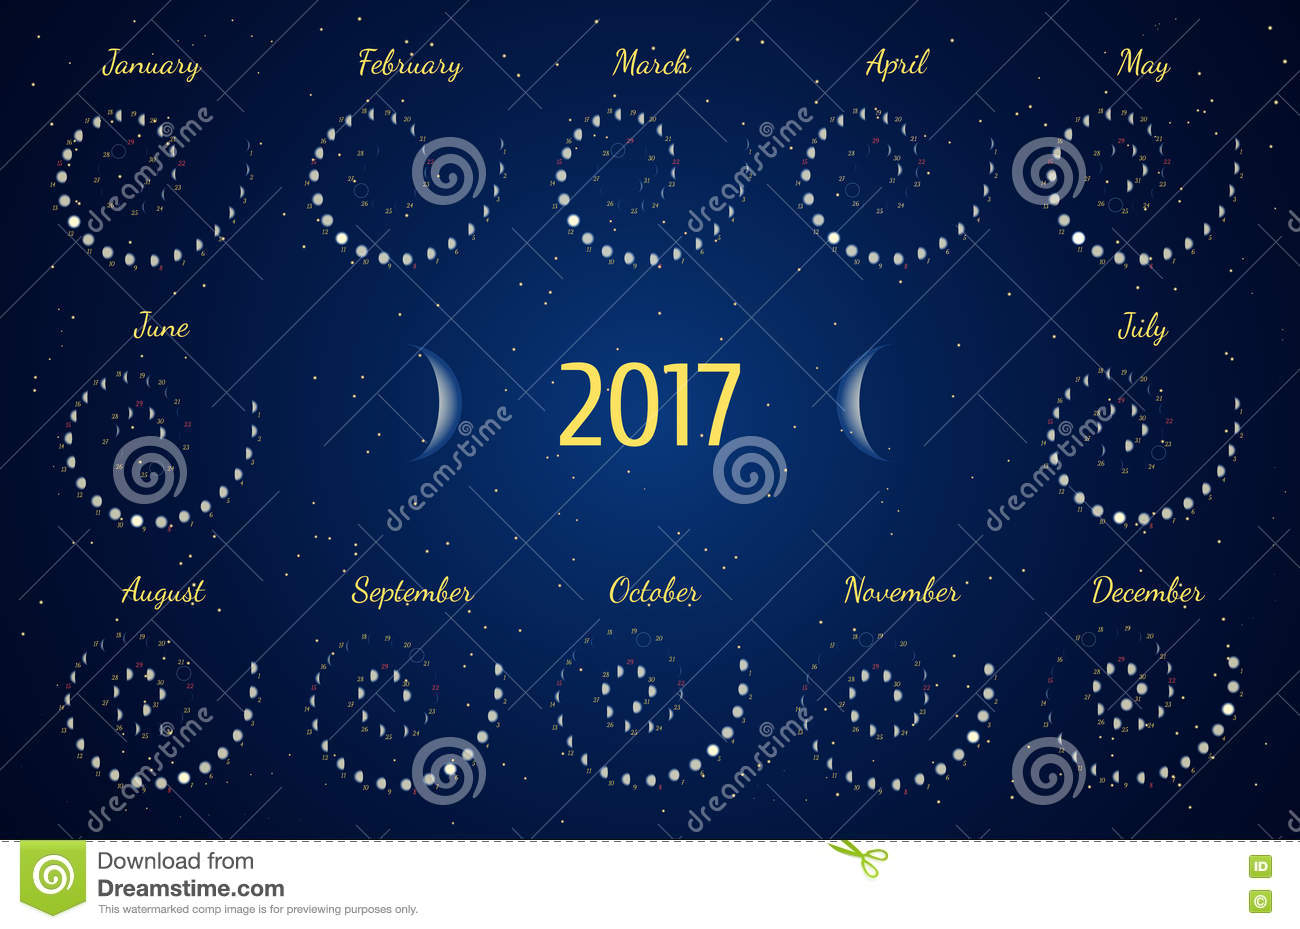 Vector Astrological Spiral Calendar For 2017. Moon Phase